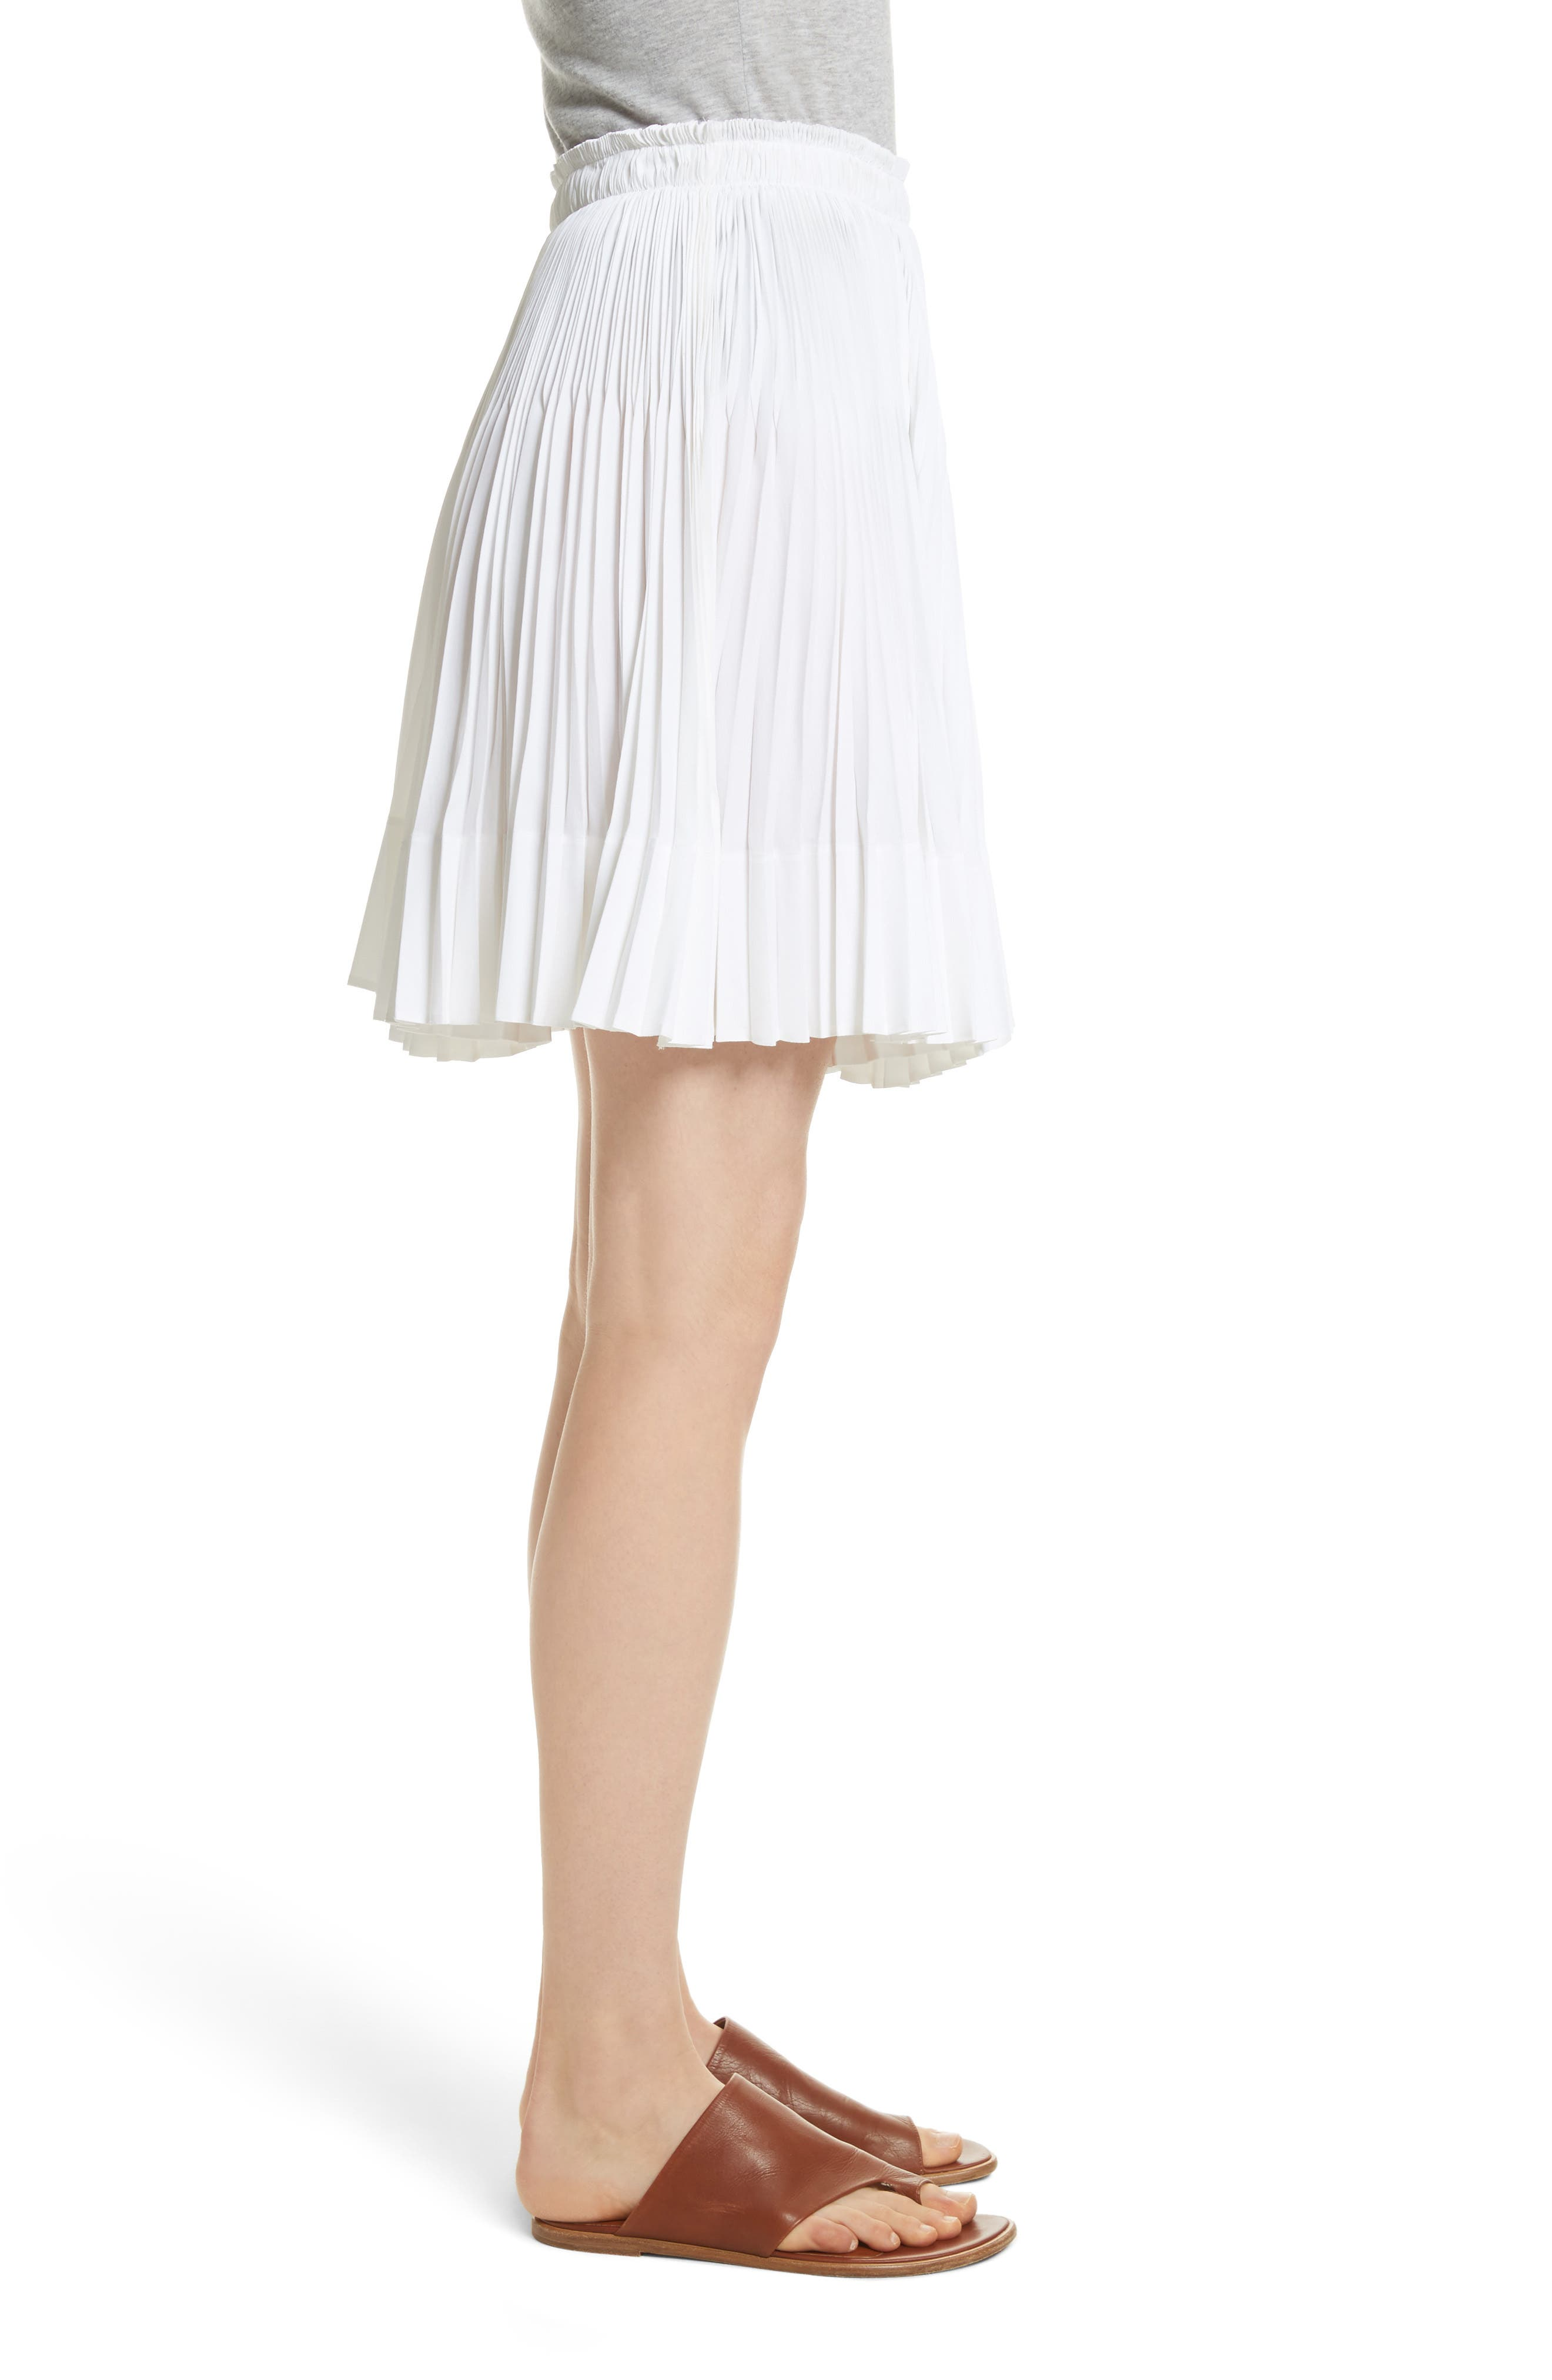 VINCE,                             Multi Pleat Skirt,                             Alternate thumbnail 3, color,                             137